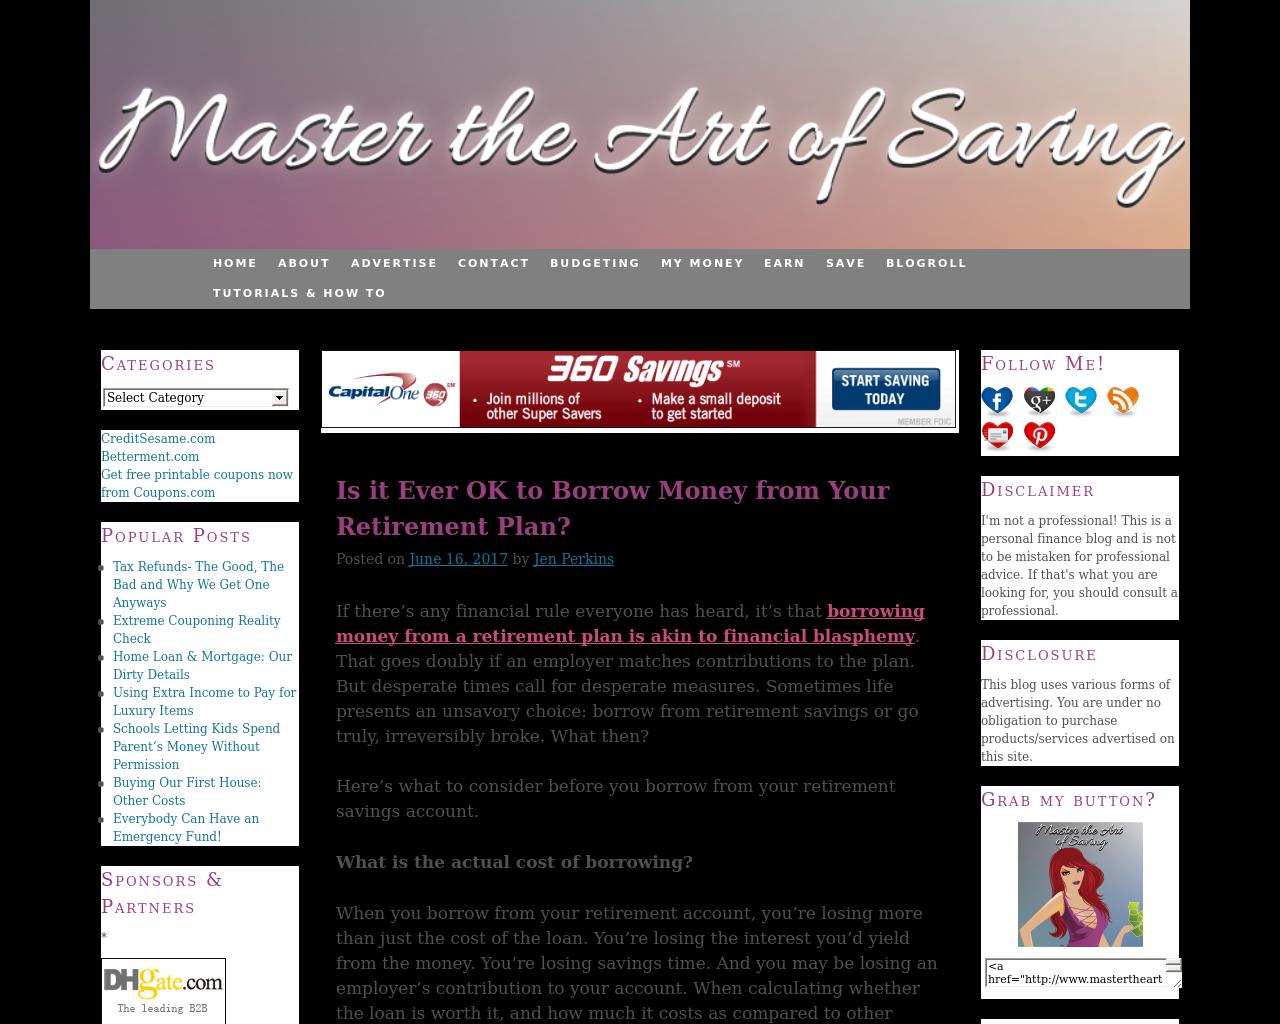 Master-The-Art-Of-Saving-Advertising-Reviews-Pricing